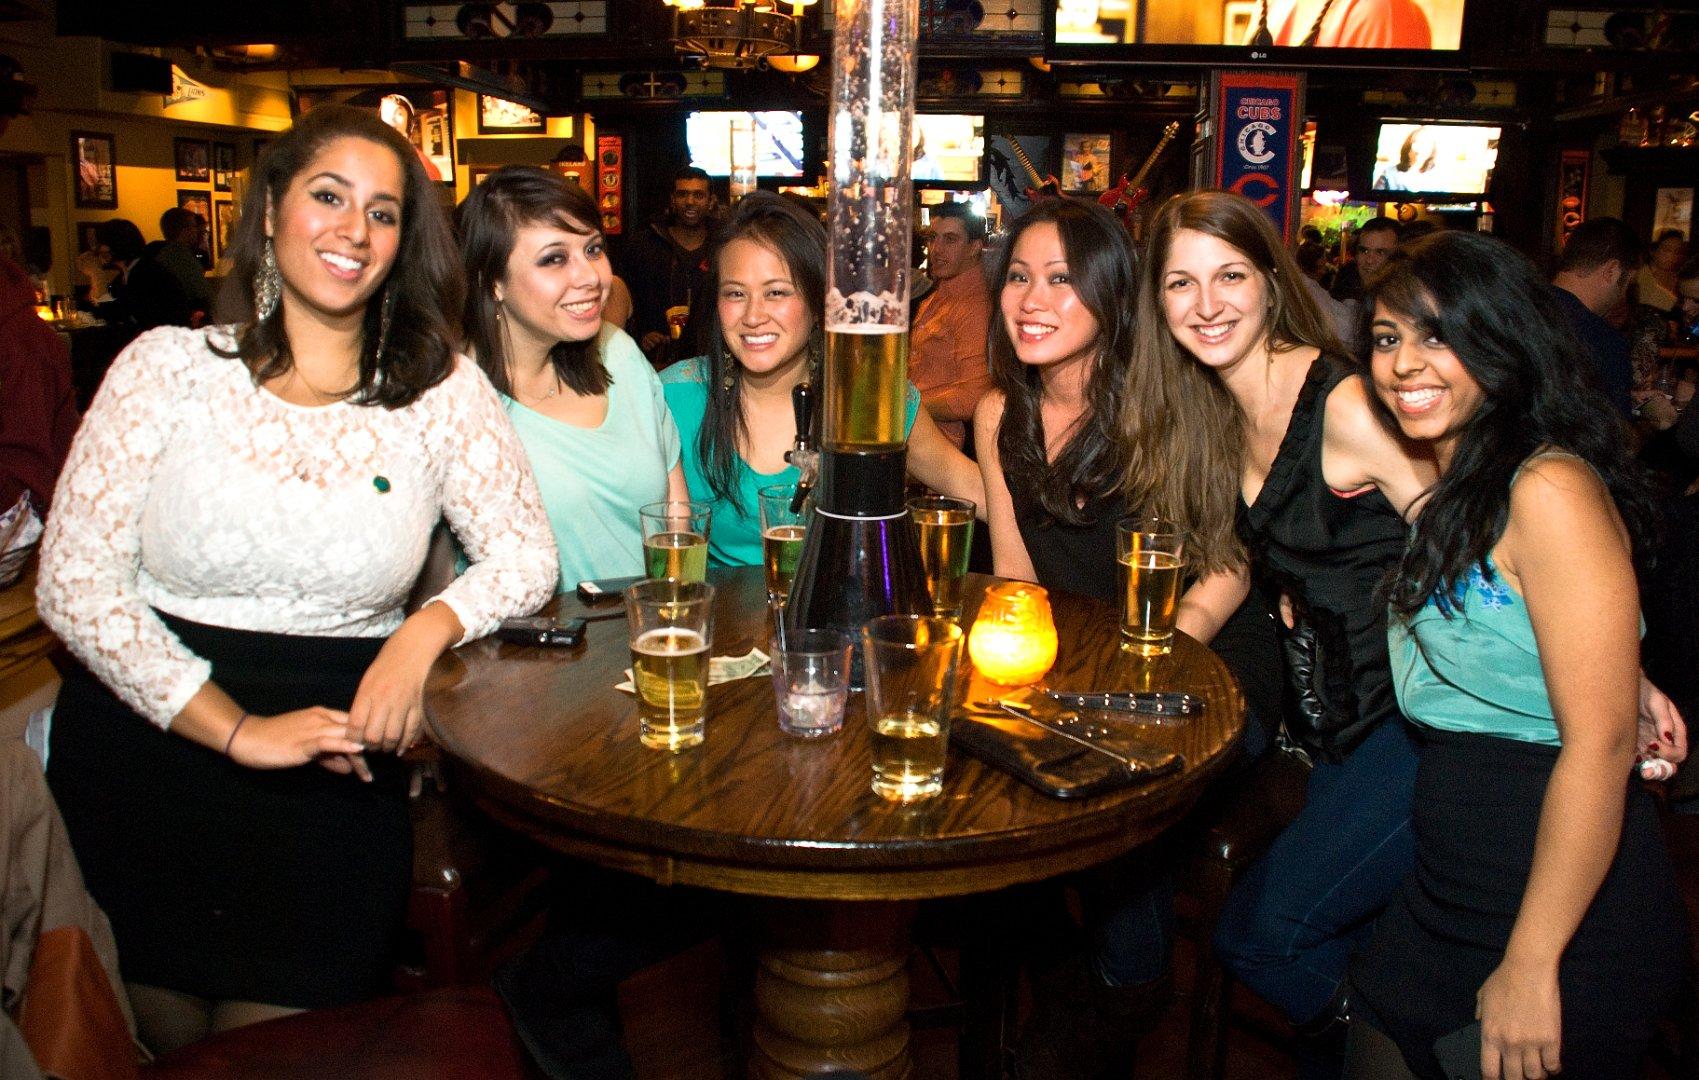 Hookup bars chicago